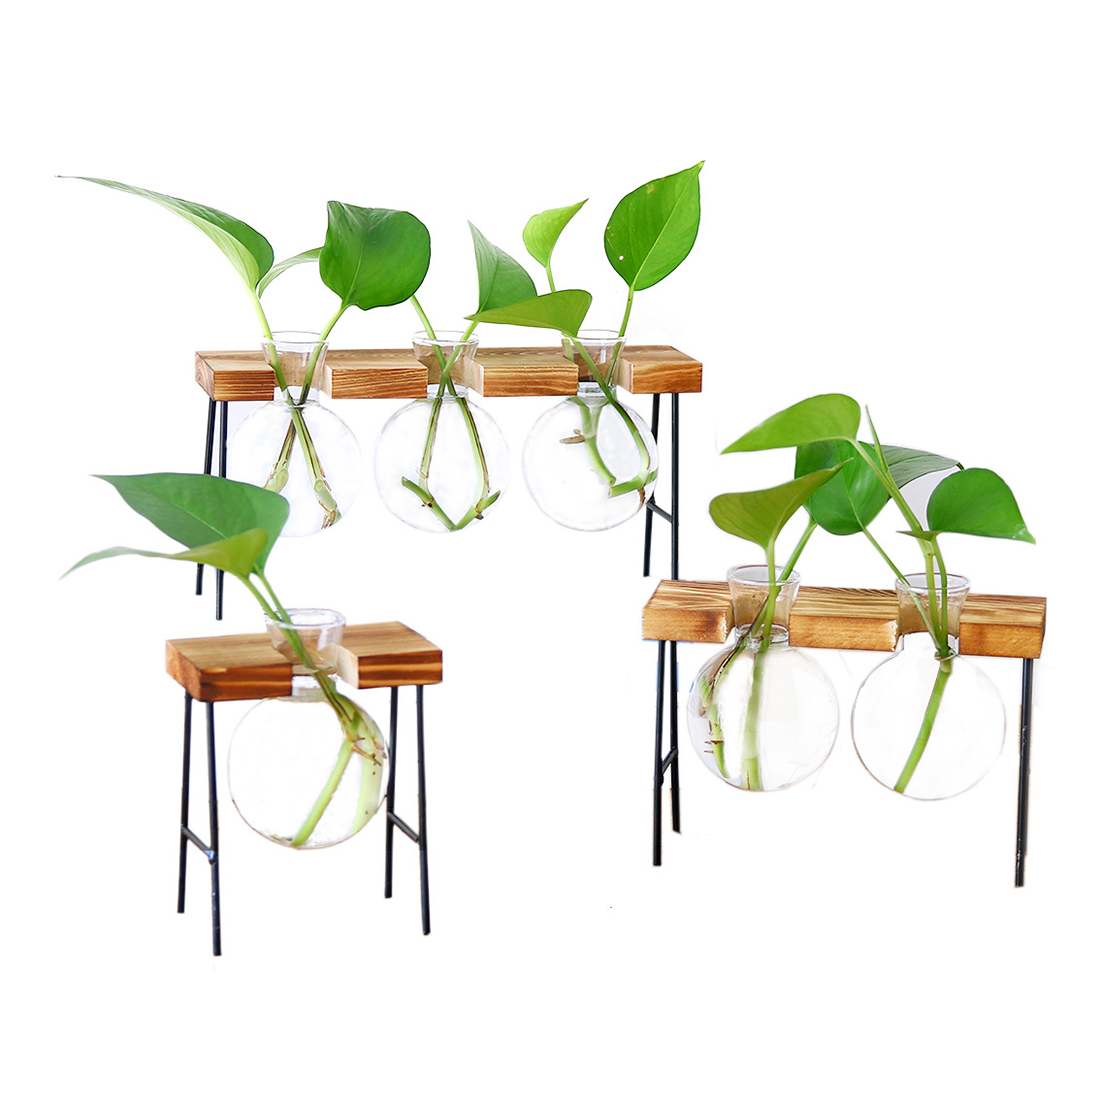 Single Hydroponic Vase